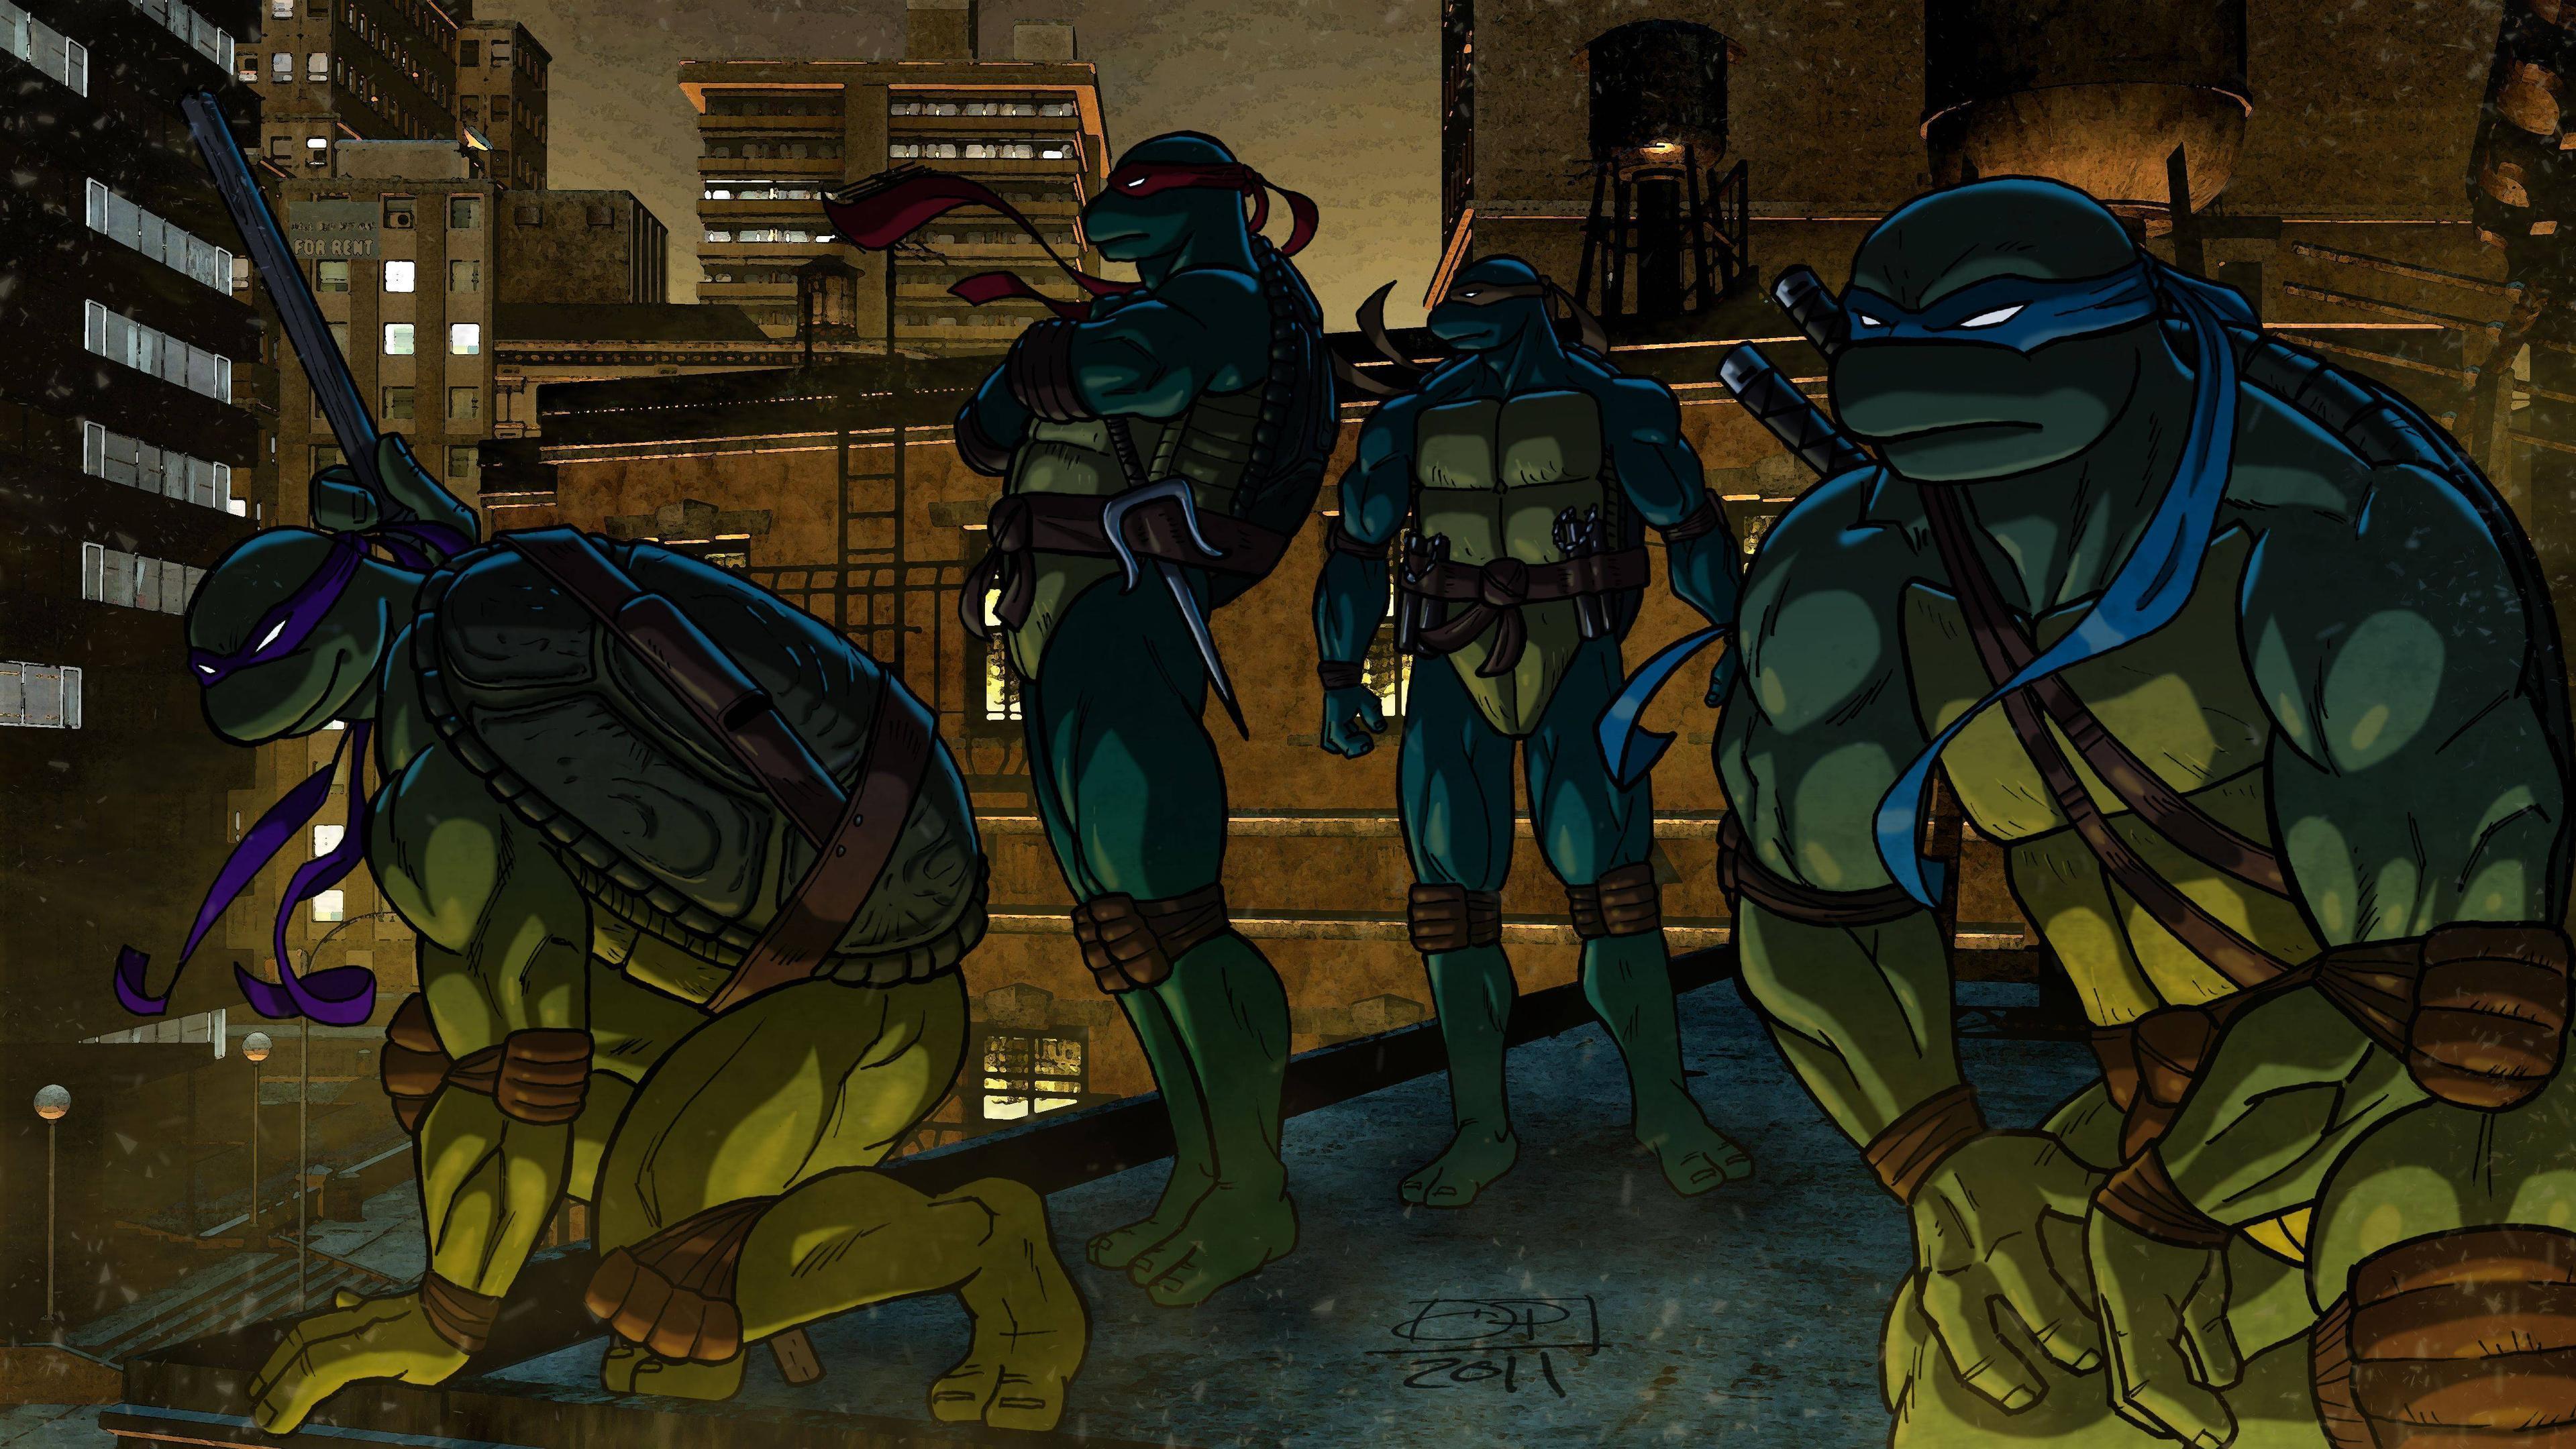 2D Teenage Mutant Ninja Turtles Wallpaper #30554 Wallpaper .